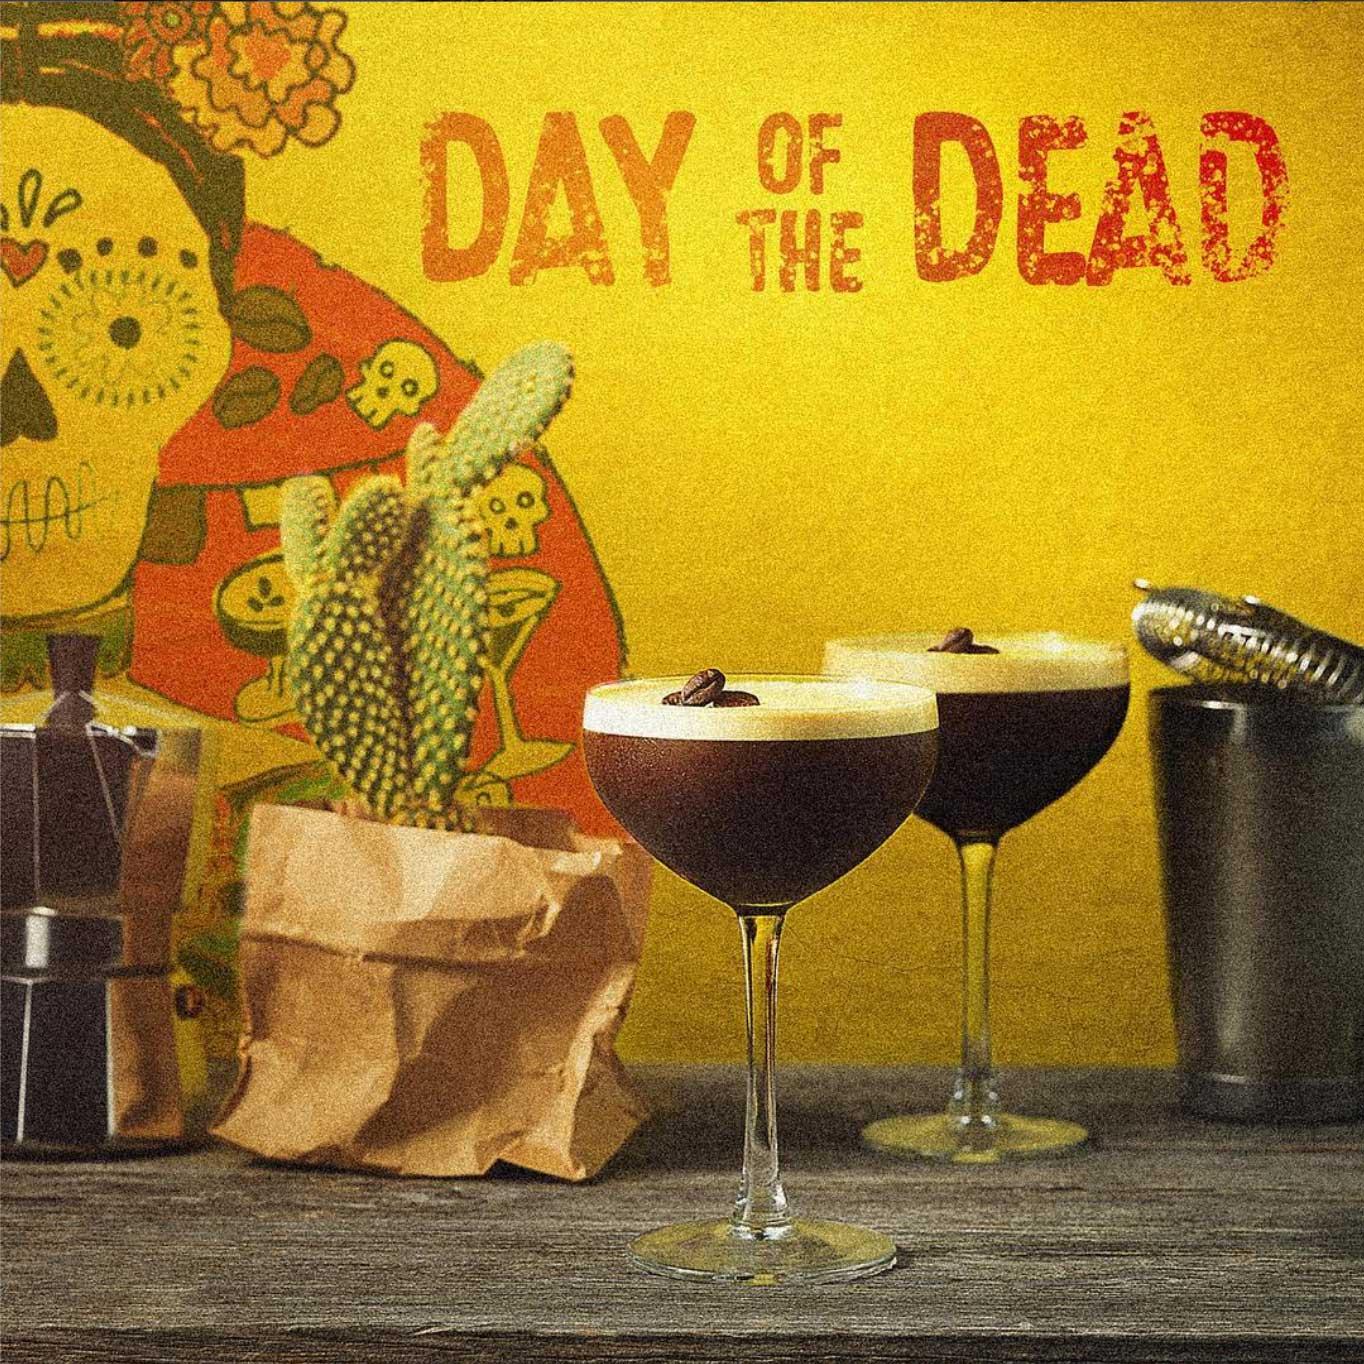 Kahlua-Key-visulal-Day-of-the-dead-mood-image-Ronny-Bergfeldt.jpg